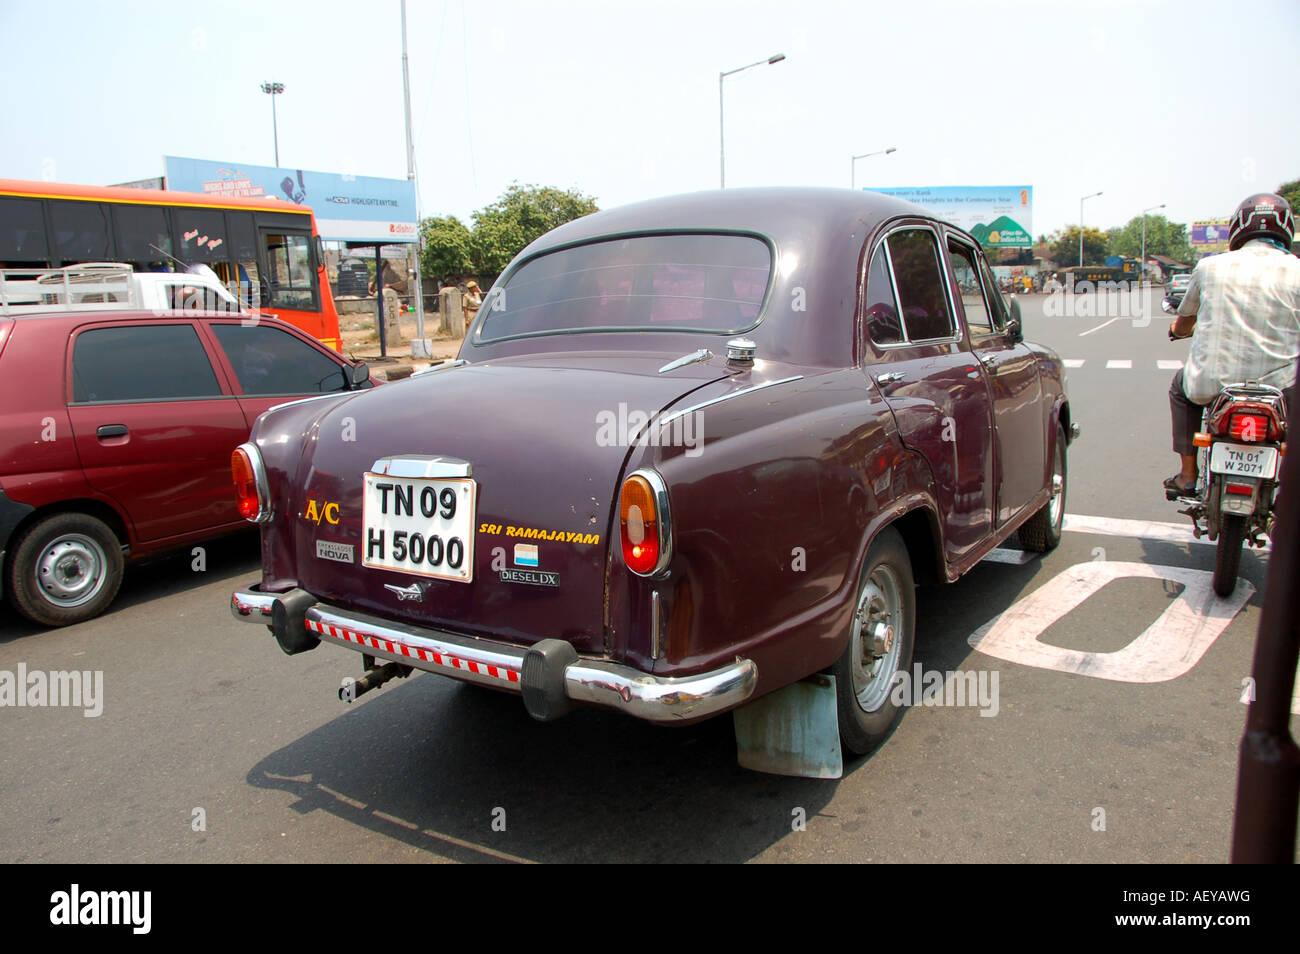 Example of Hindustan Ambassador car in India - Stock Image